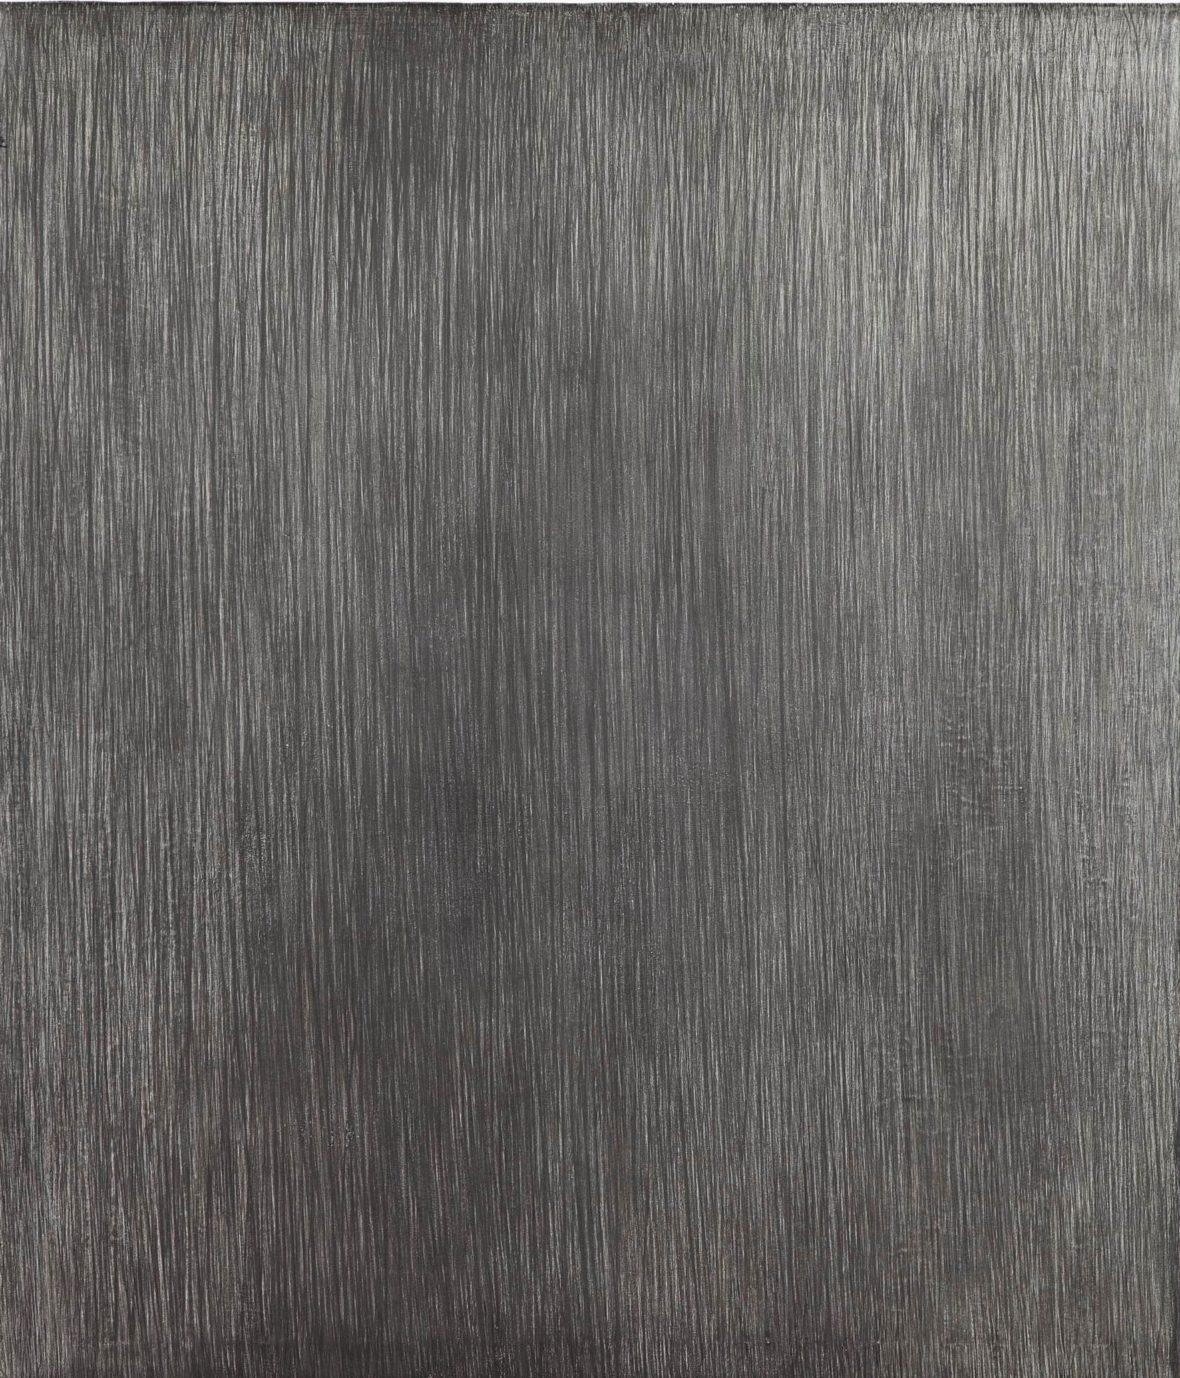 Pusulan harmaa/Pusula gray, kuva Timo Laitala